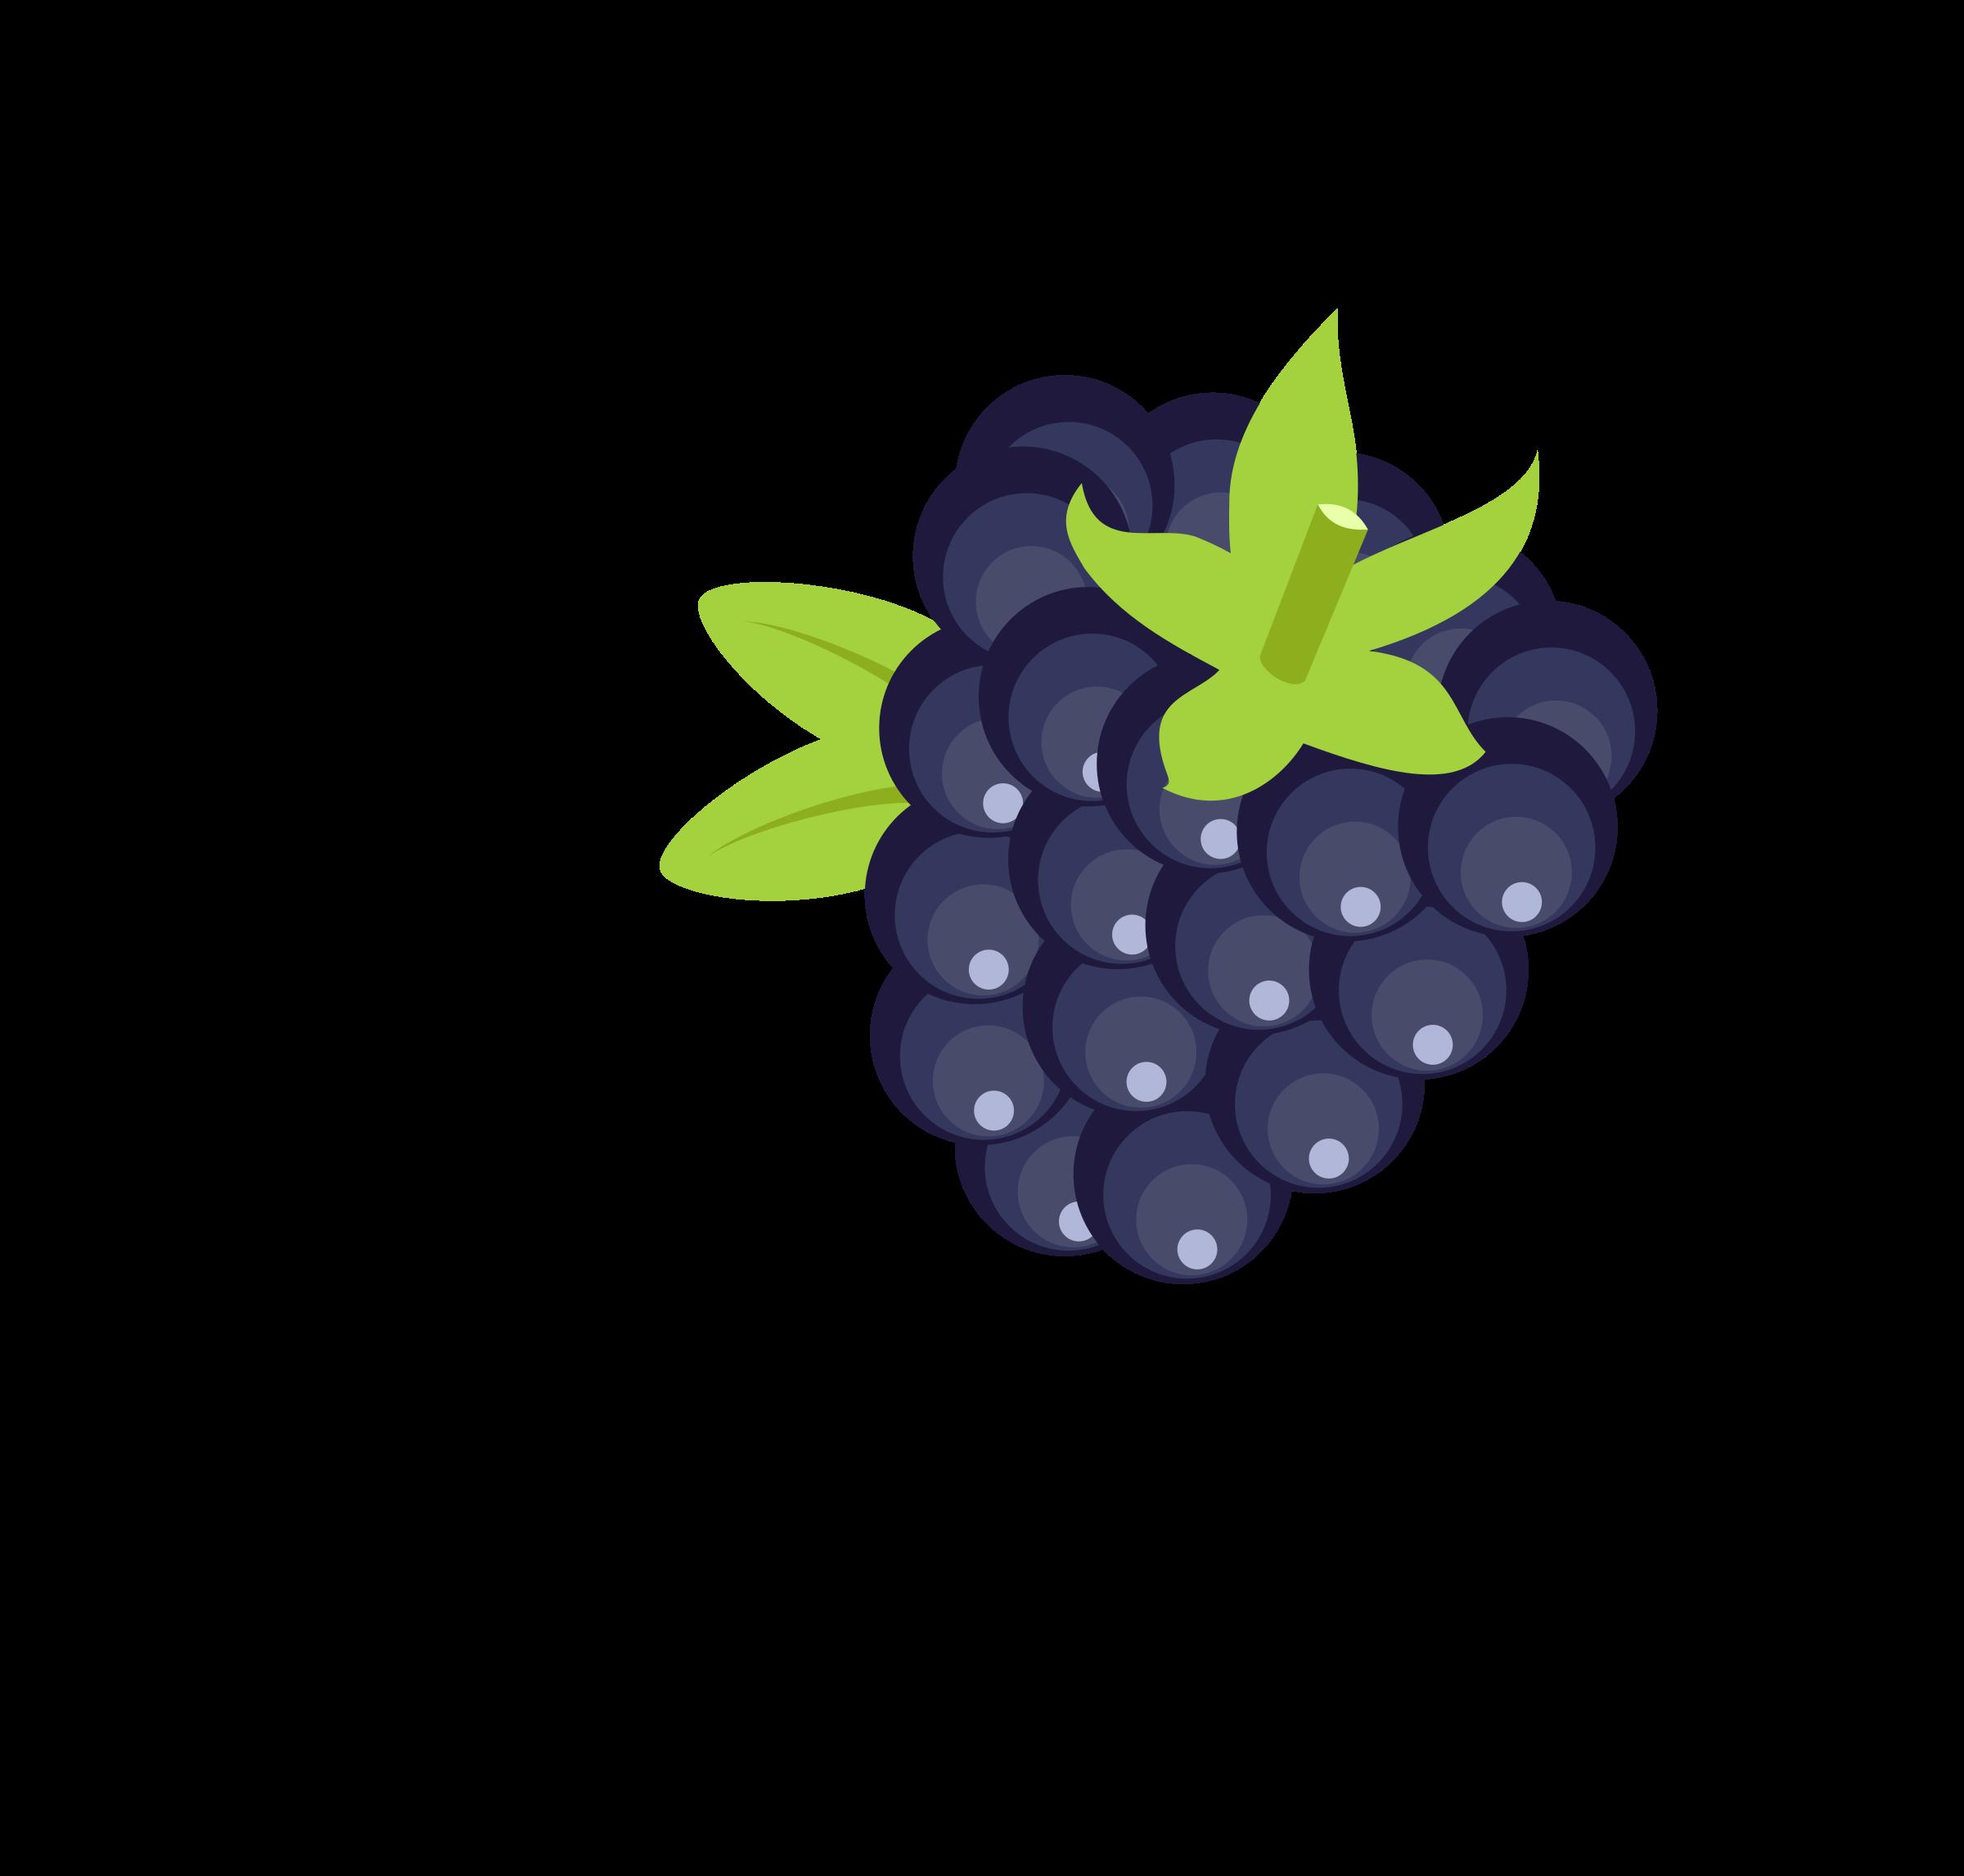 free png Blackberry Clipart images transparent